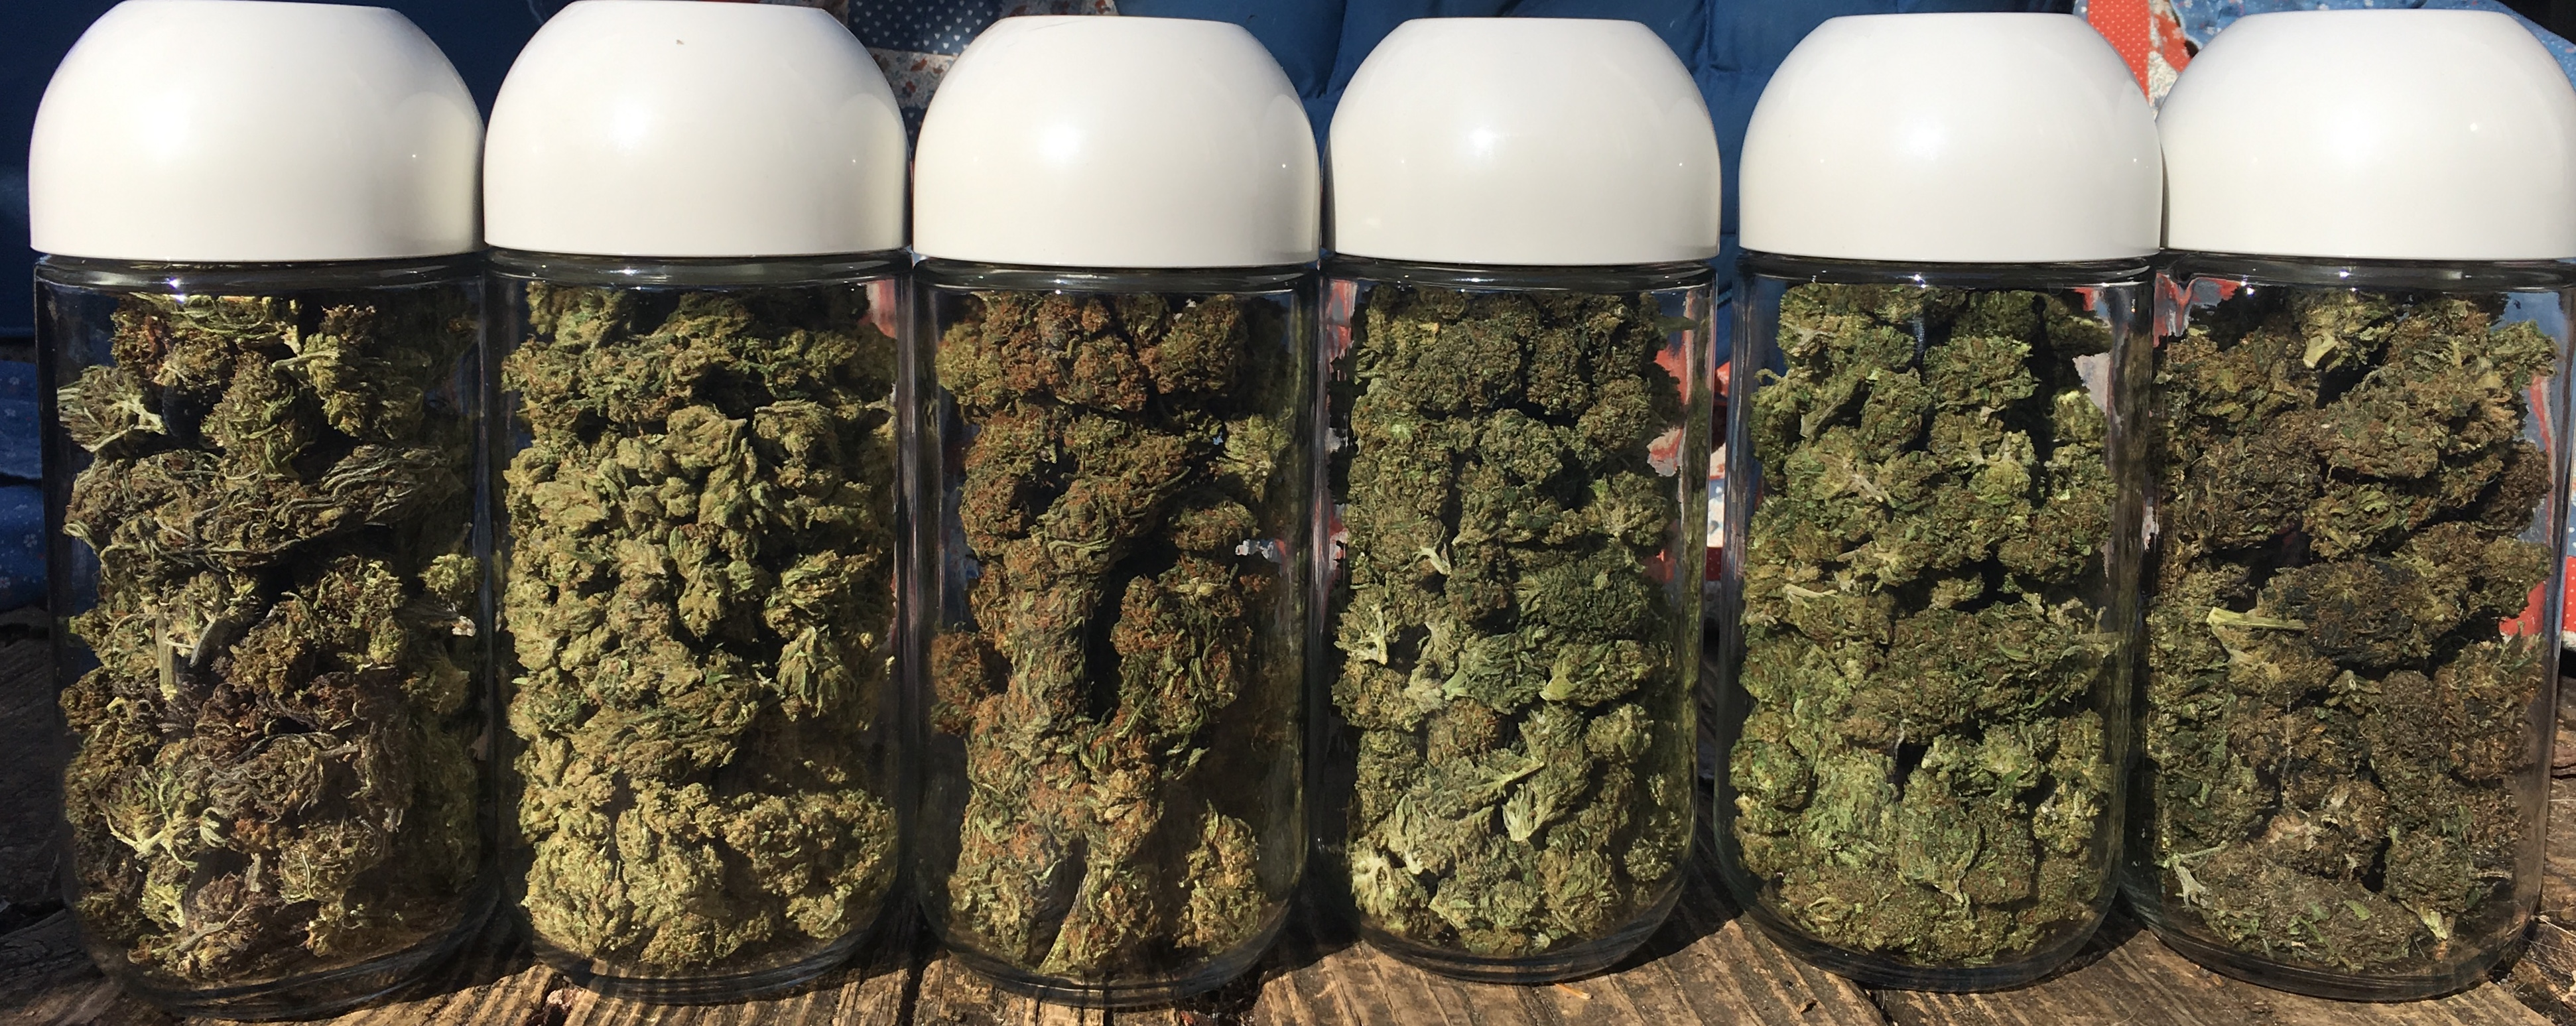 6 jars of different types of hemp